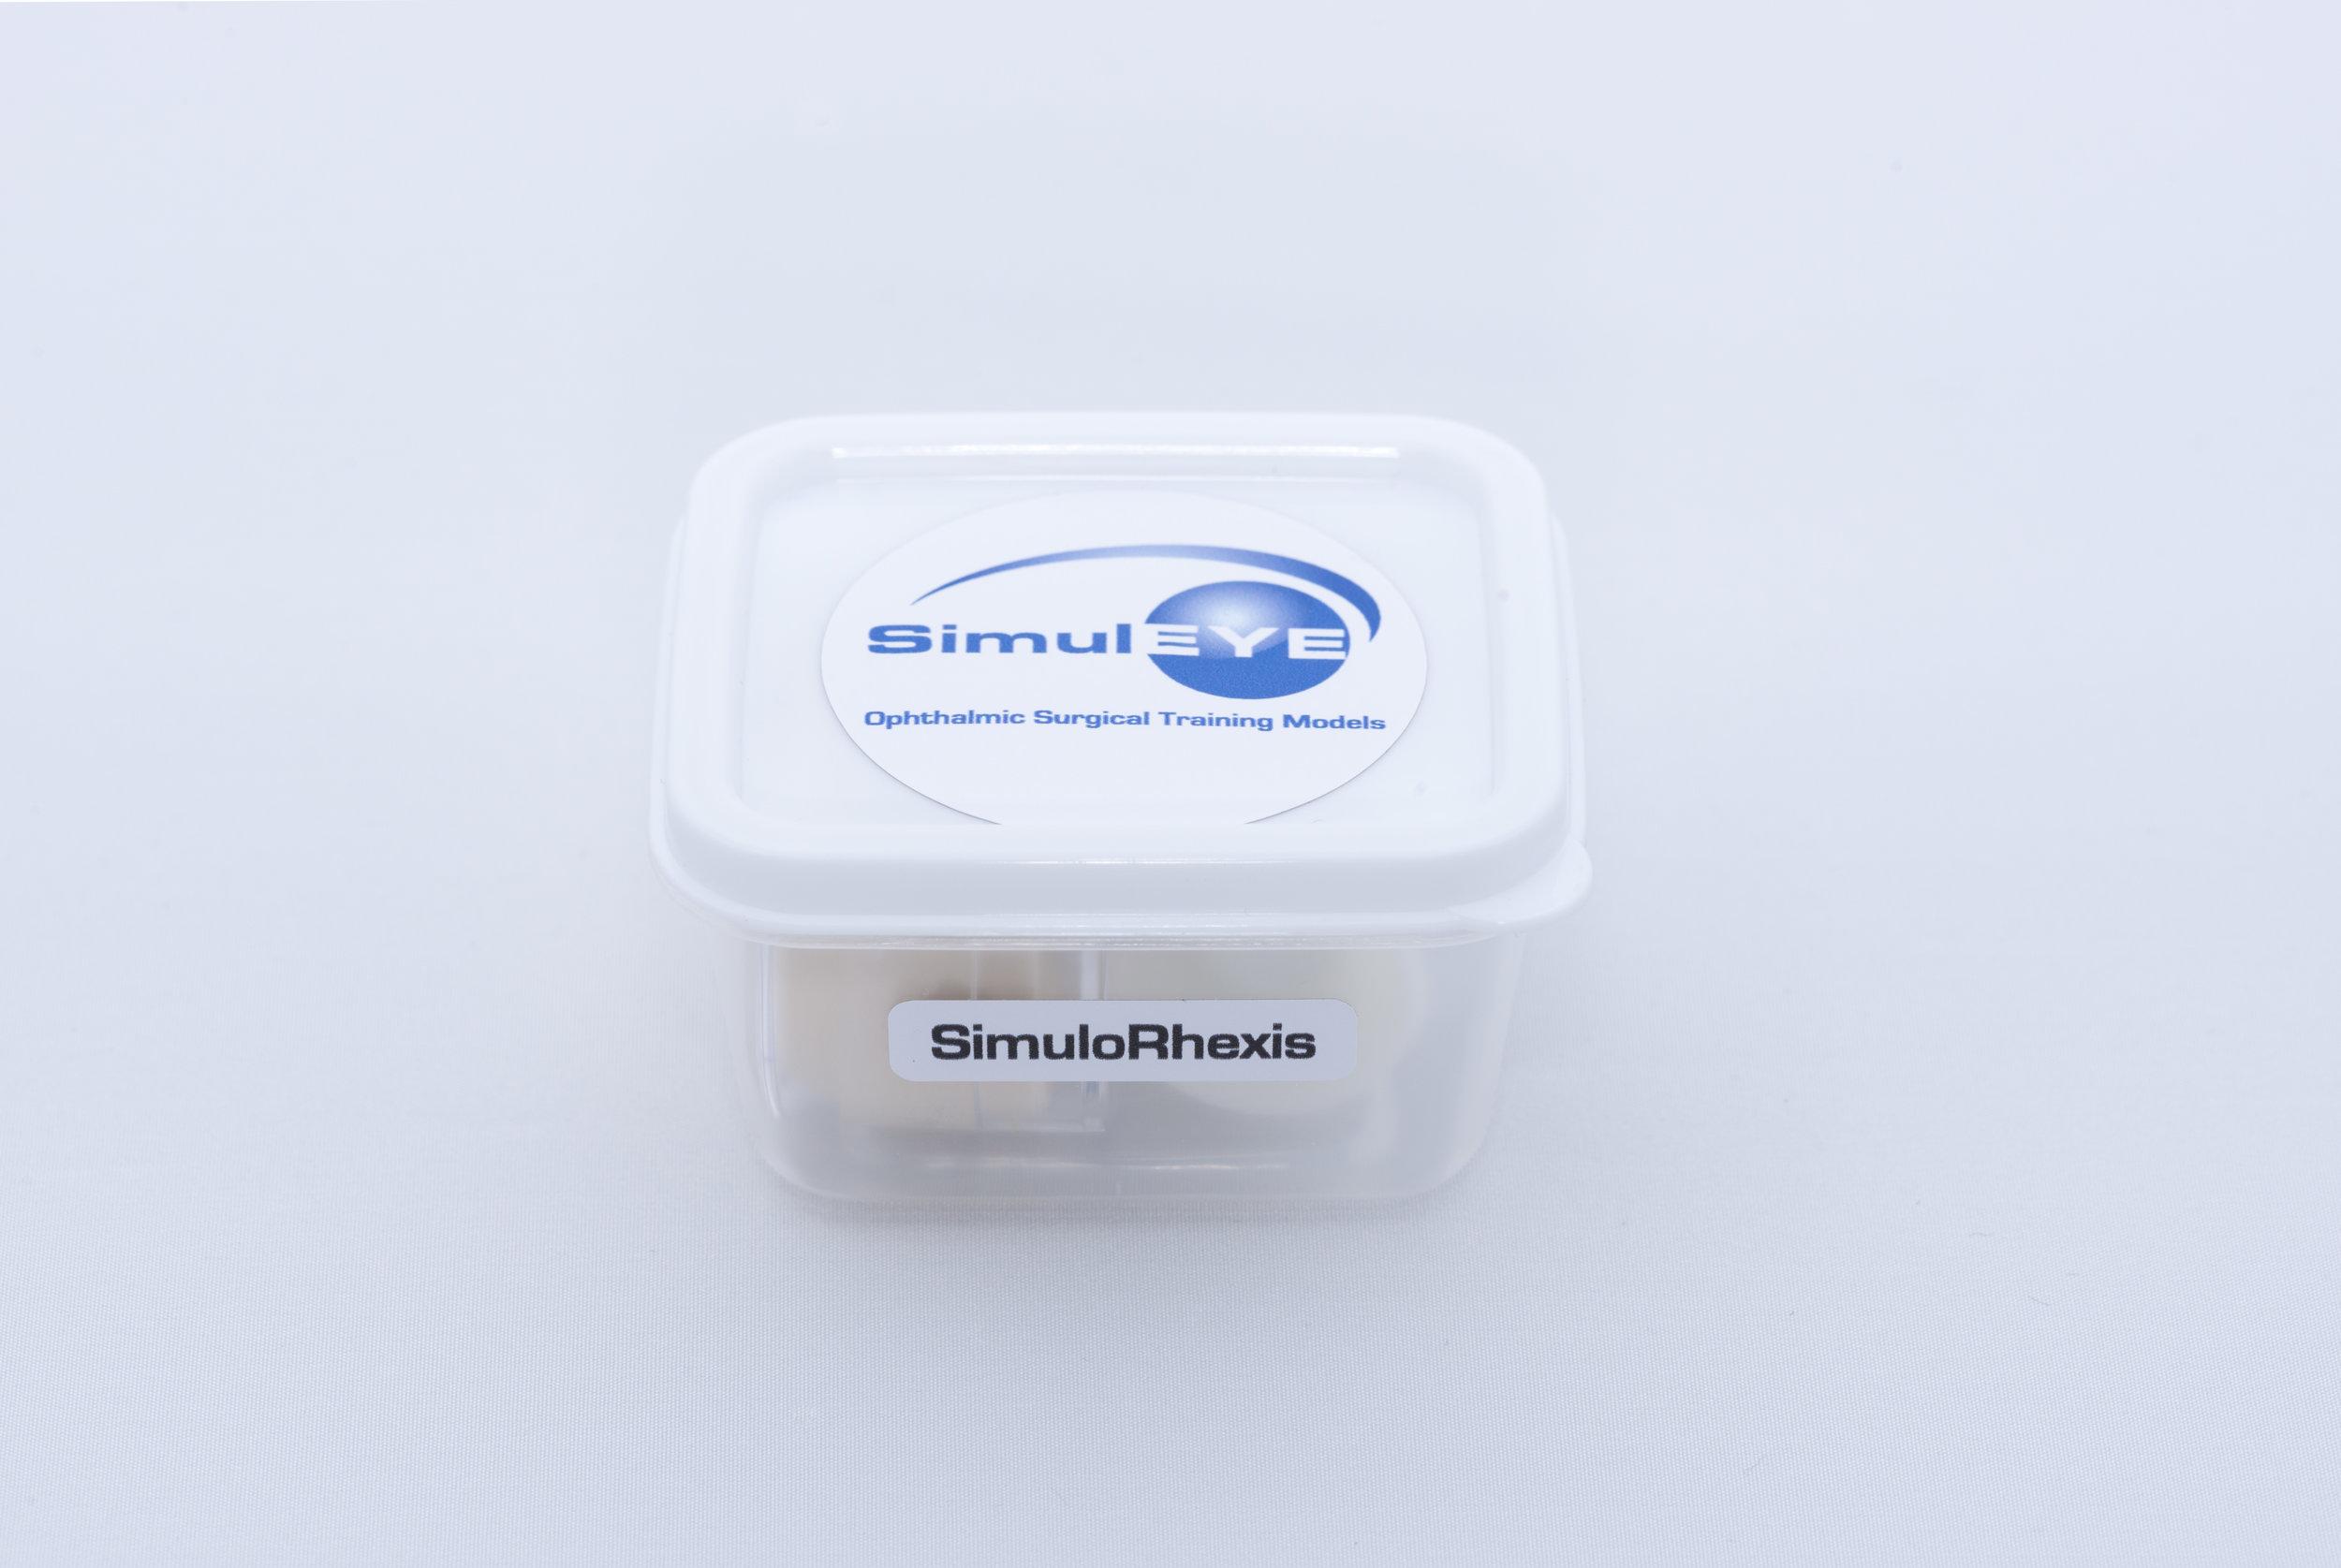 SimuloRhexis Kit.jpg